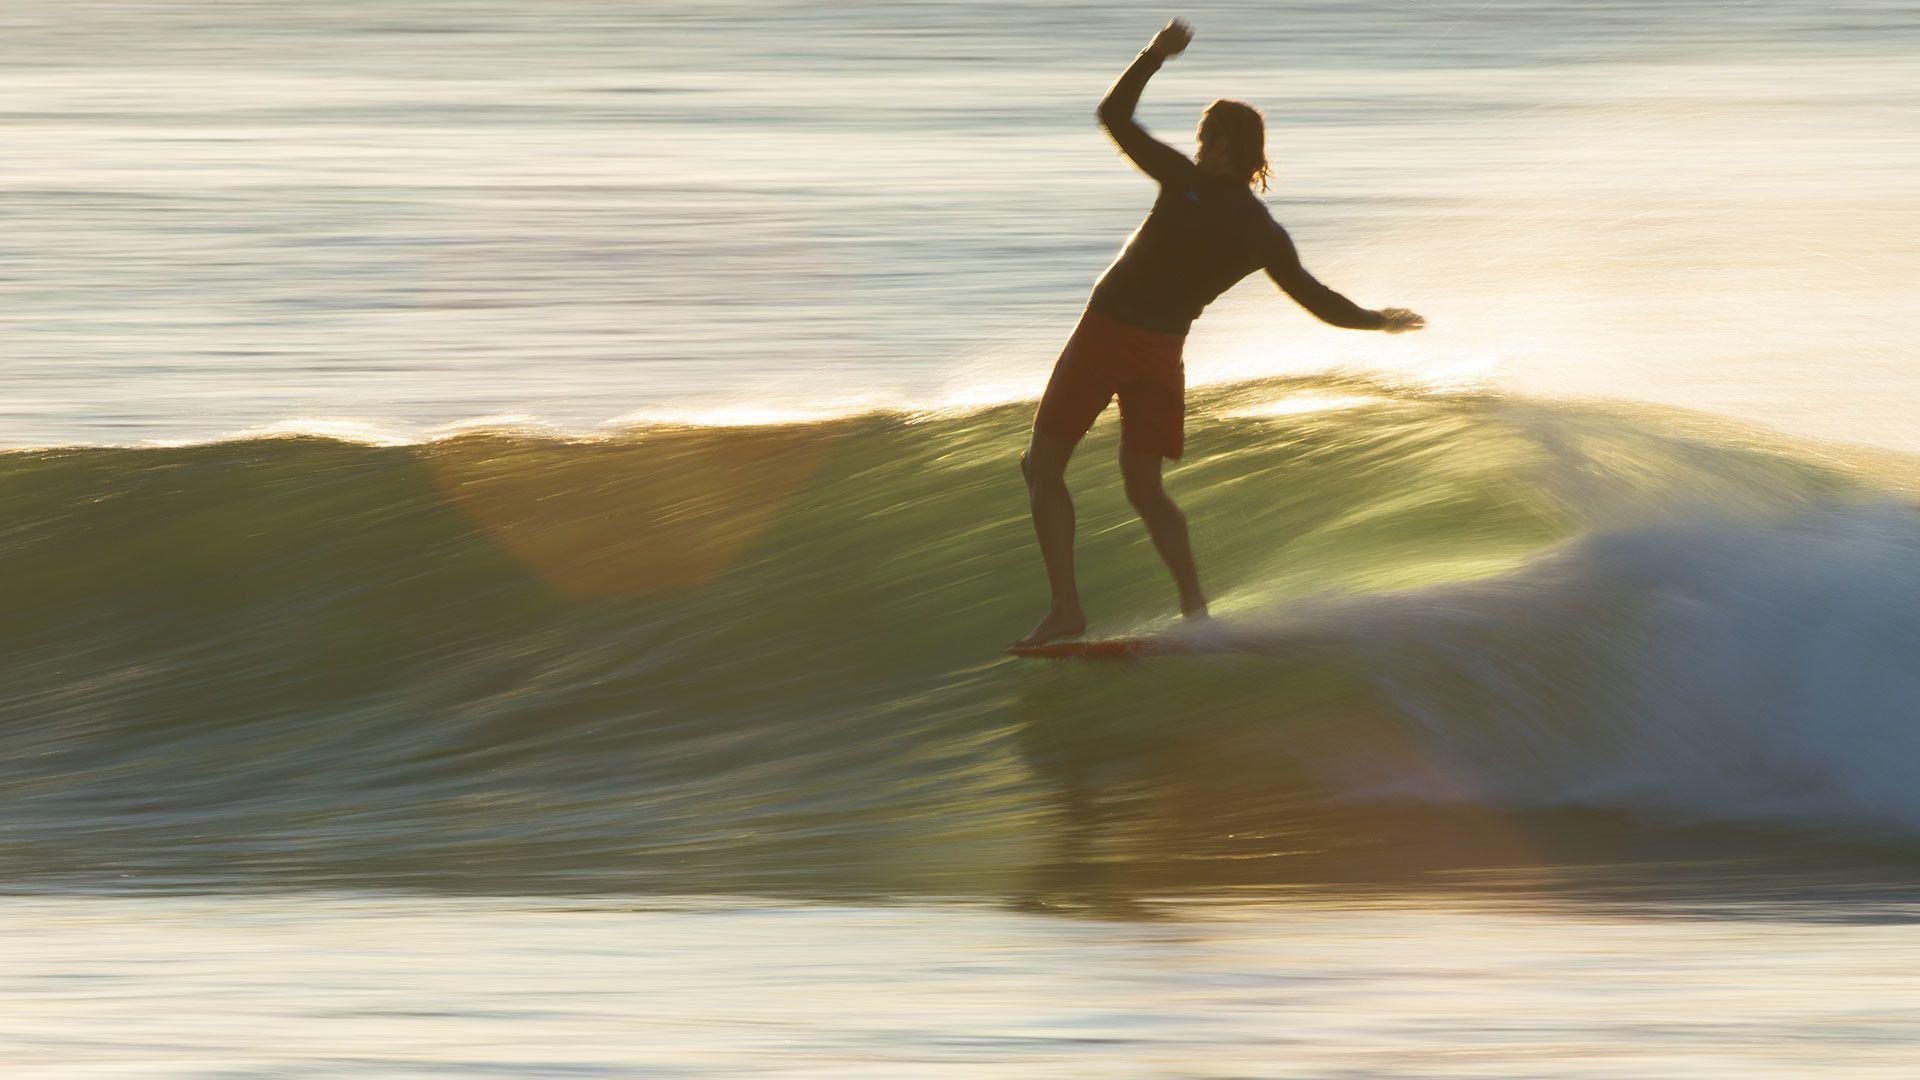 surf longboard wallpapers hd wallpaper cave